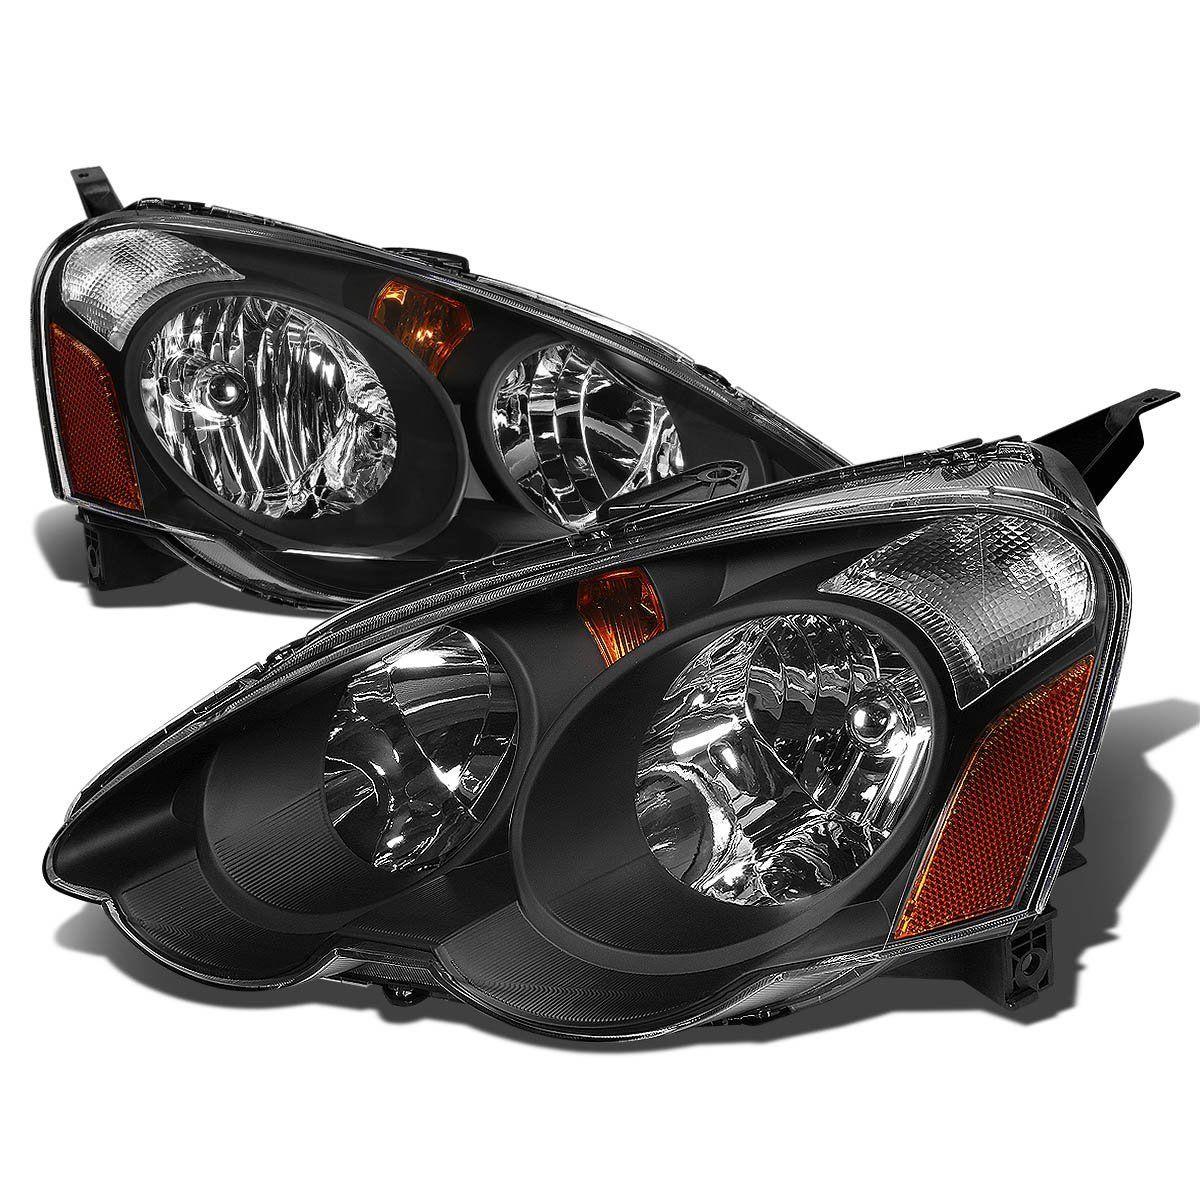 Spec-D 2002-2004 Acura RSX JDM Style Crystal Headlights